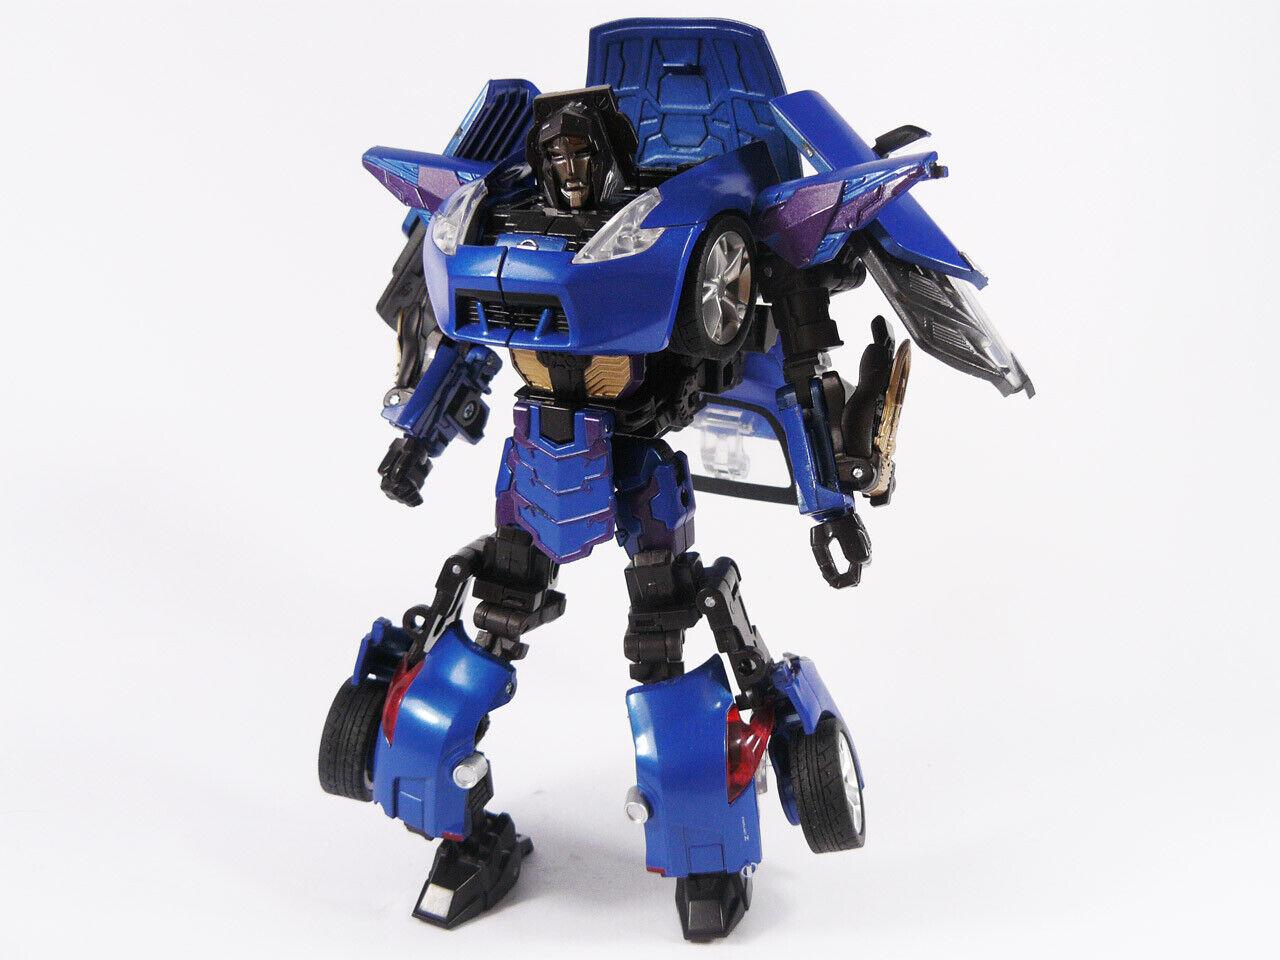 Transformers Alternity Megatron Nissan Fairlady Z Premium Le-Mans bluee - Takara